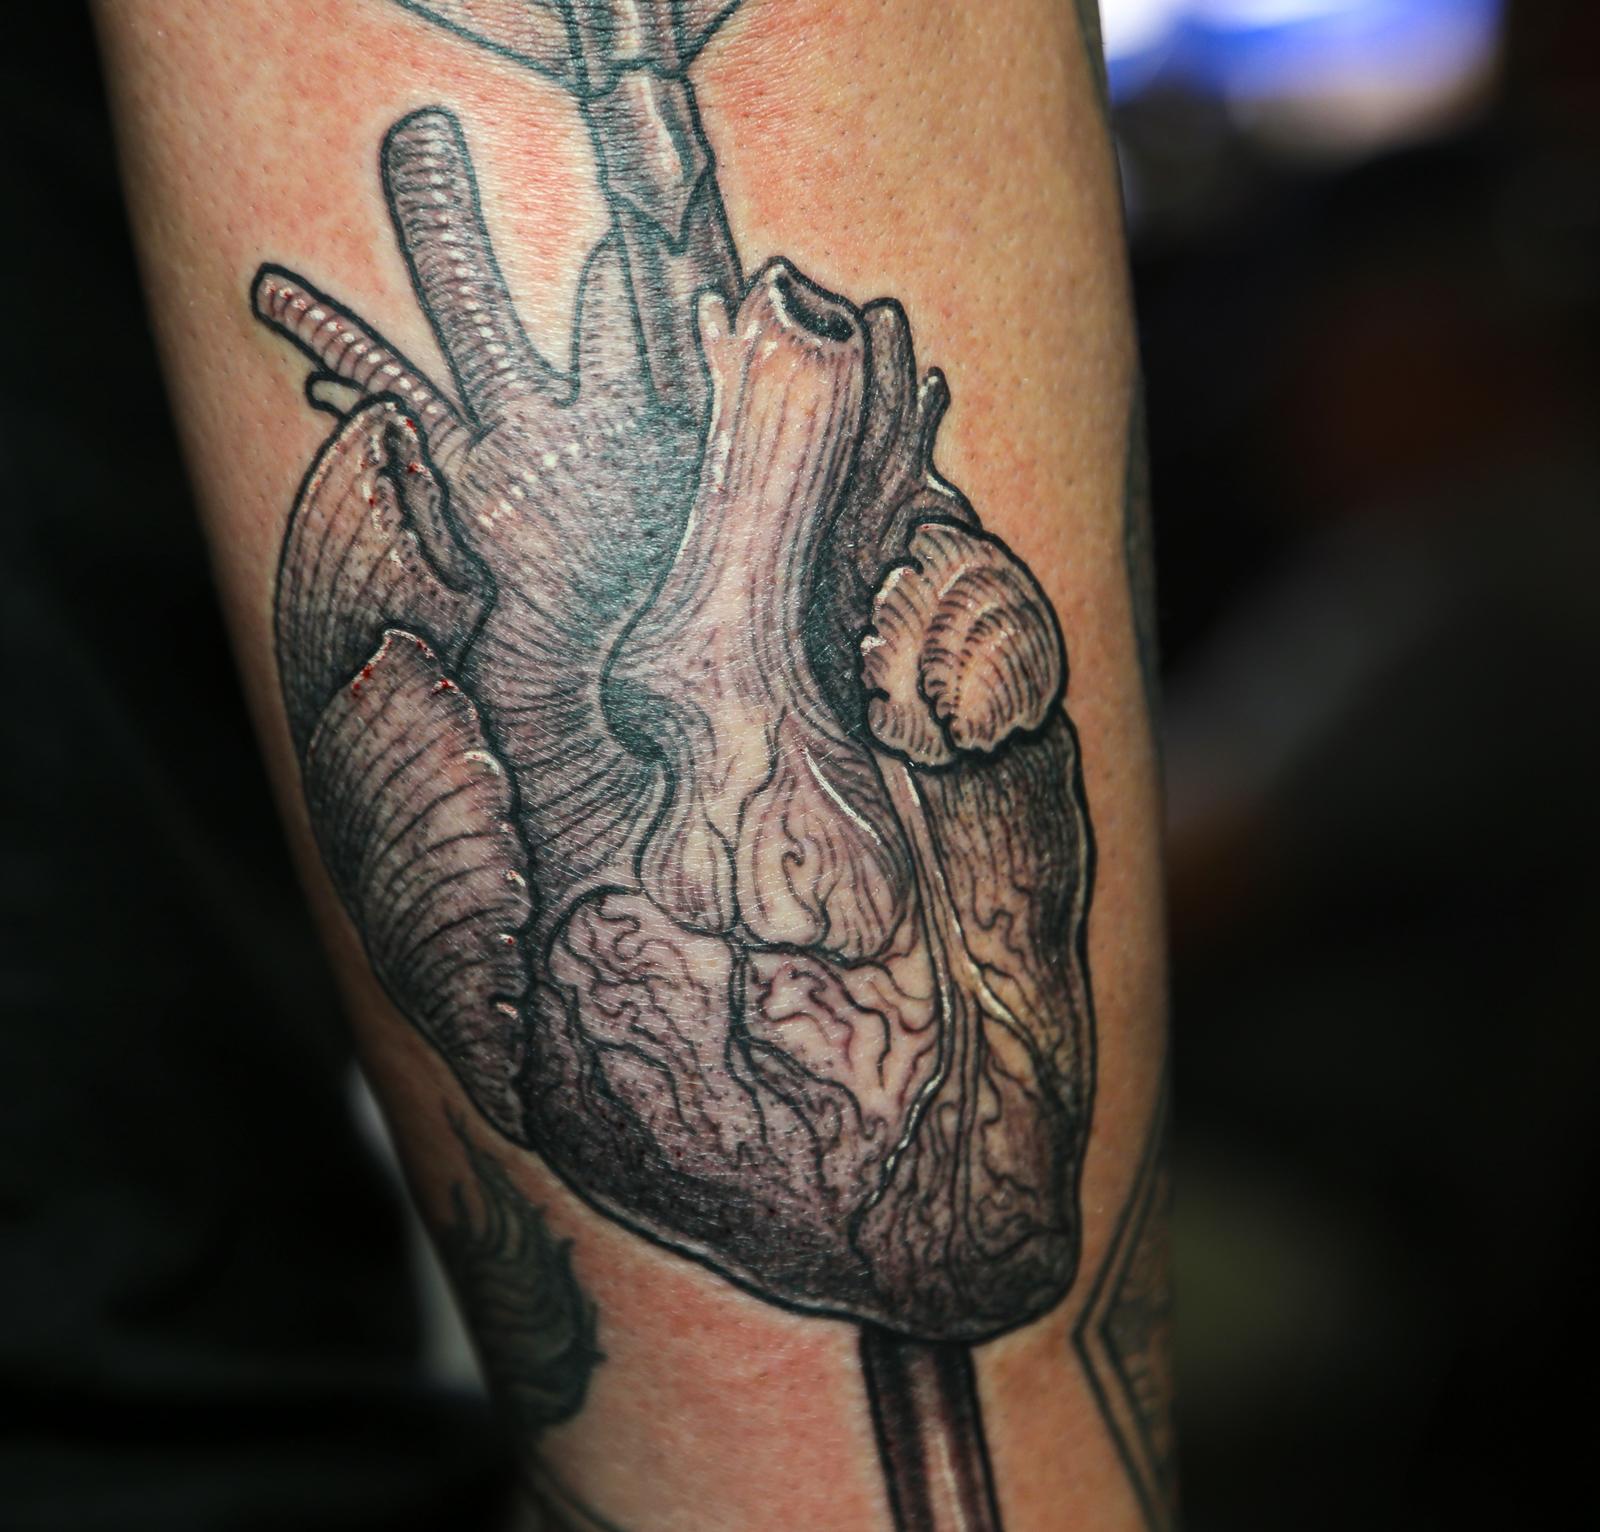 heart with arrow 2 enrique bernal ejay tattoo.jpg